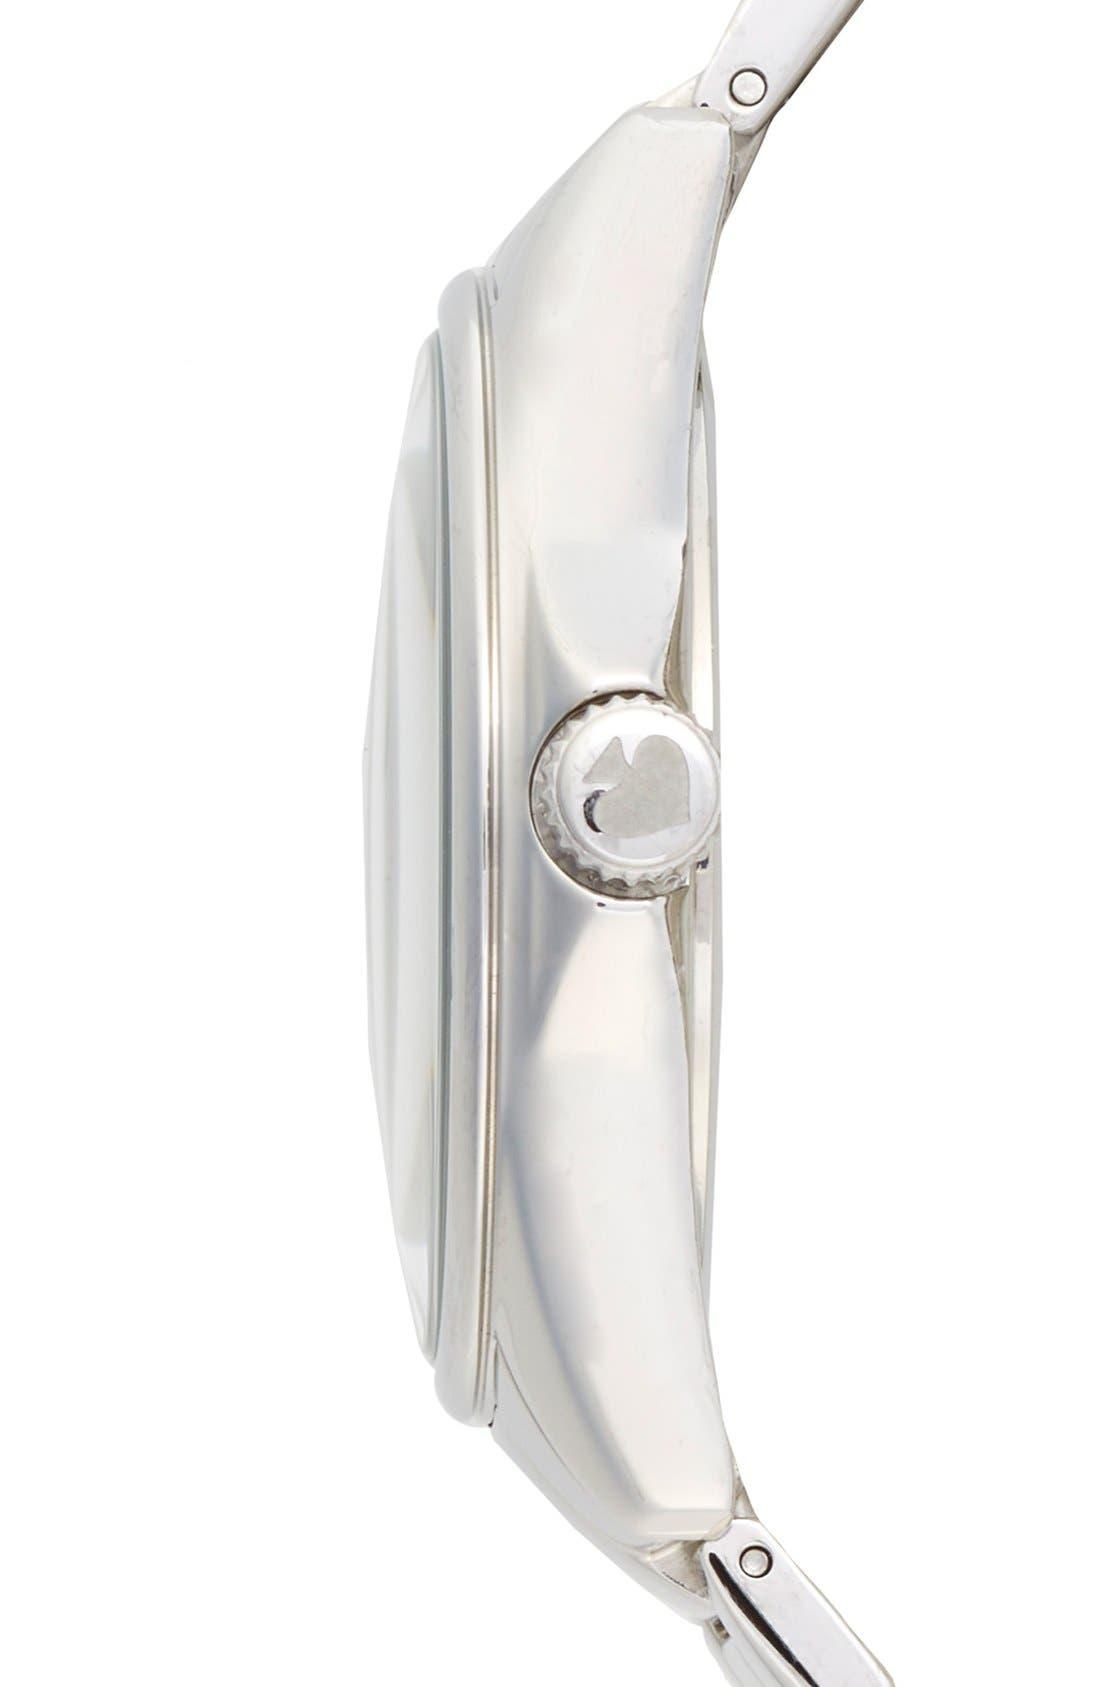 KATE SPADE NEW YORK, 'seaport grand' bracelet watch, 38mm, Alternate thumbnail 2, color, 040